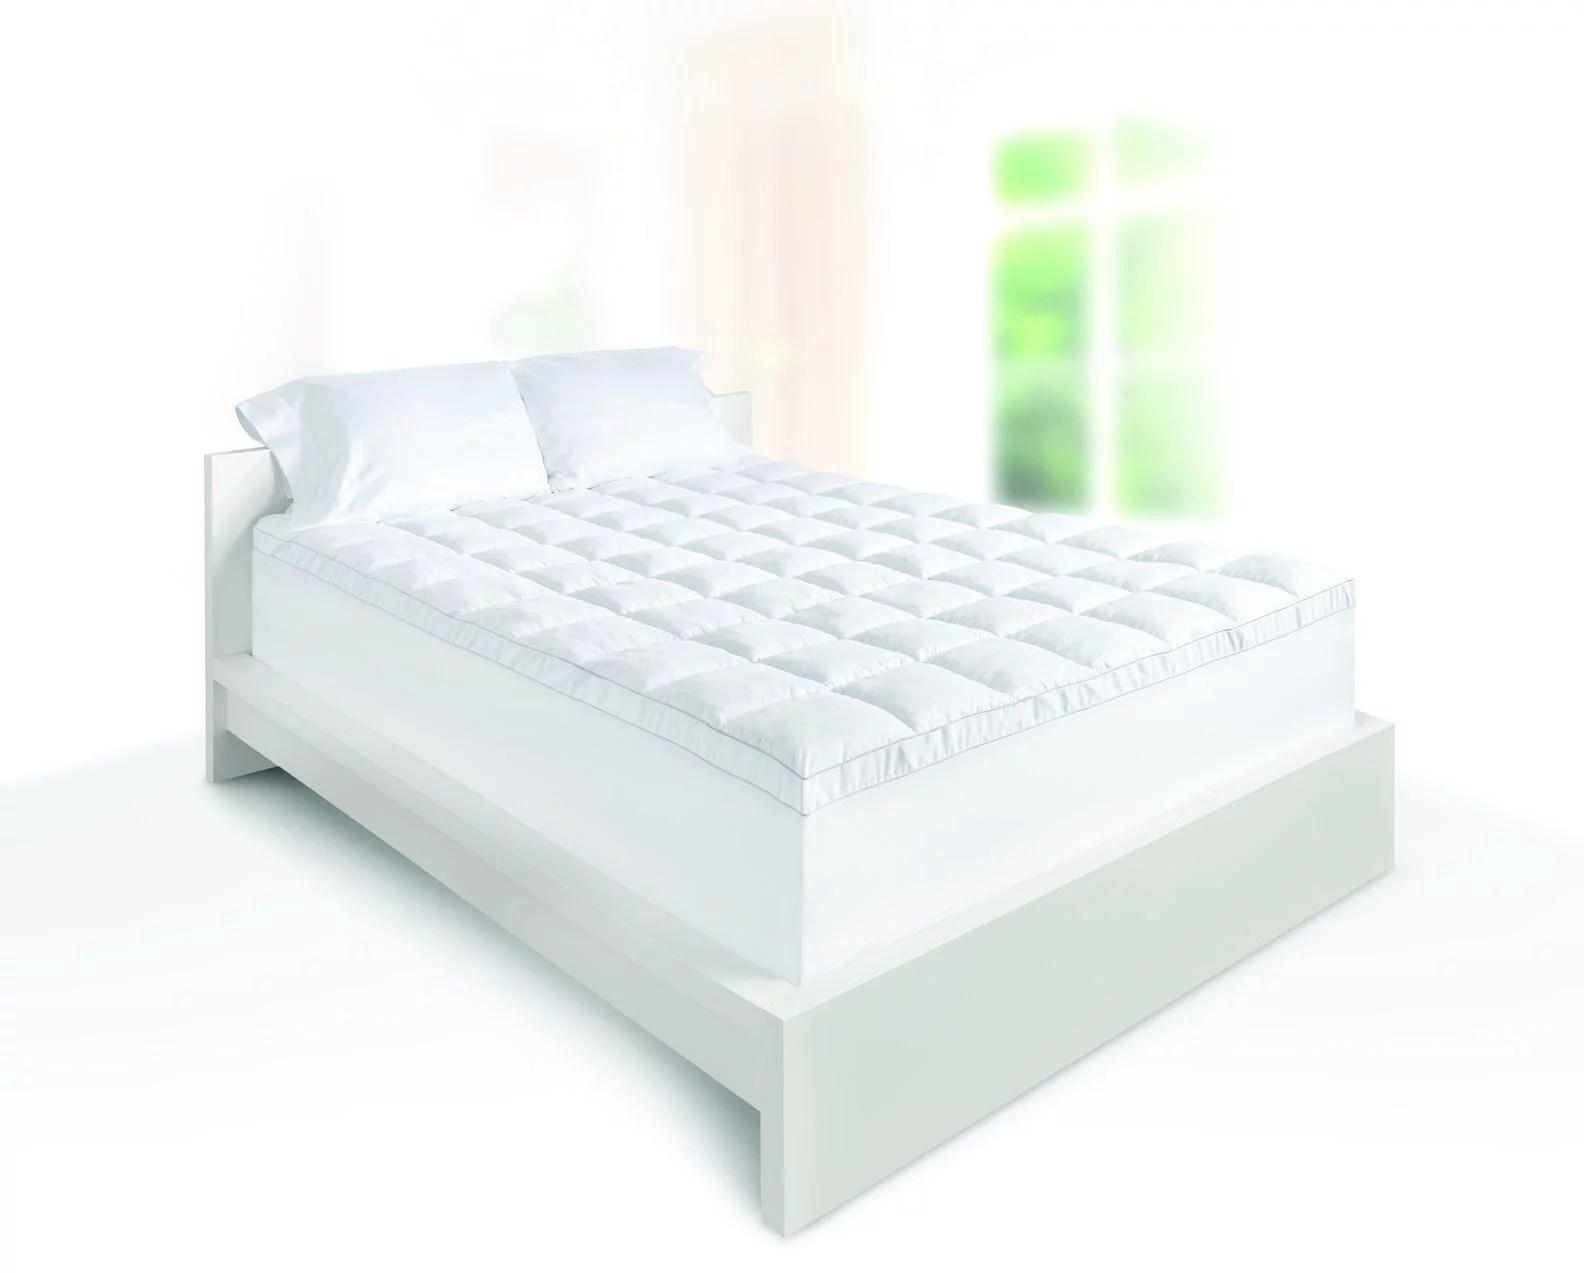 dream serenity memory foam 4 luxury pillow top mattress topper 1 each